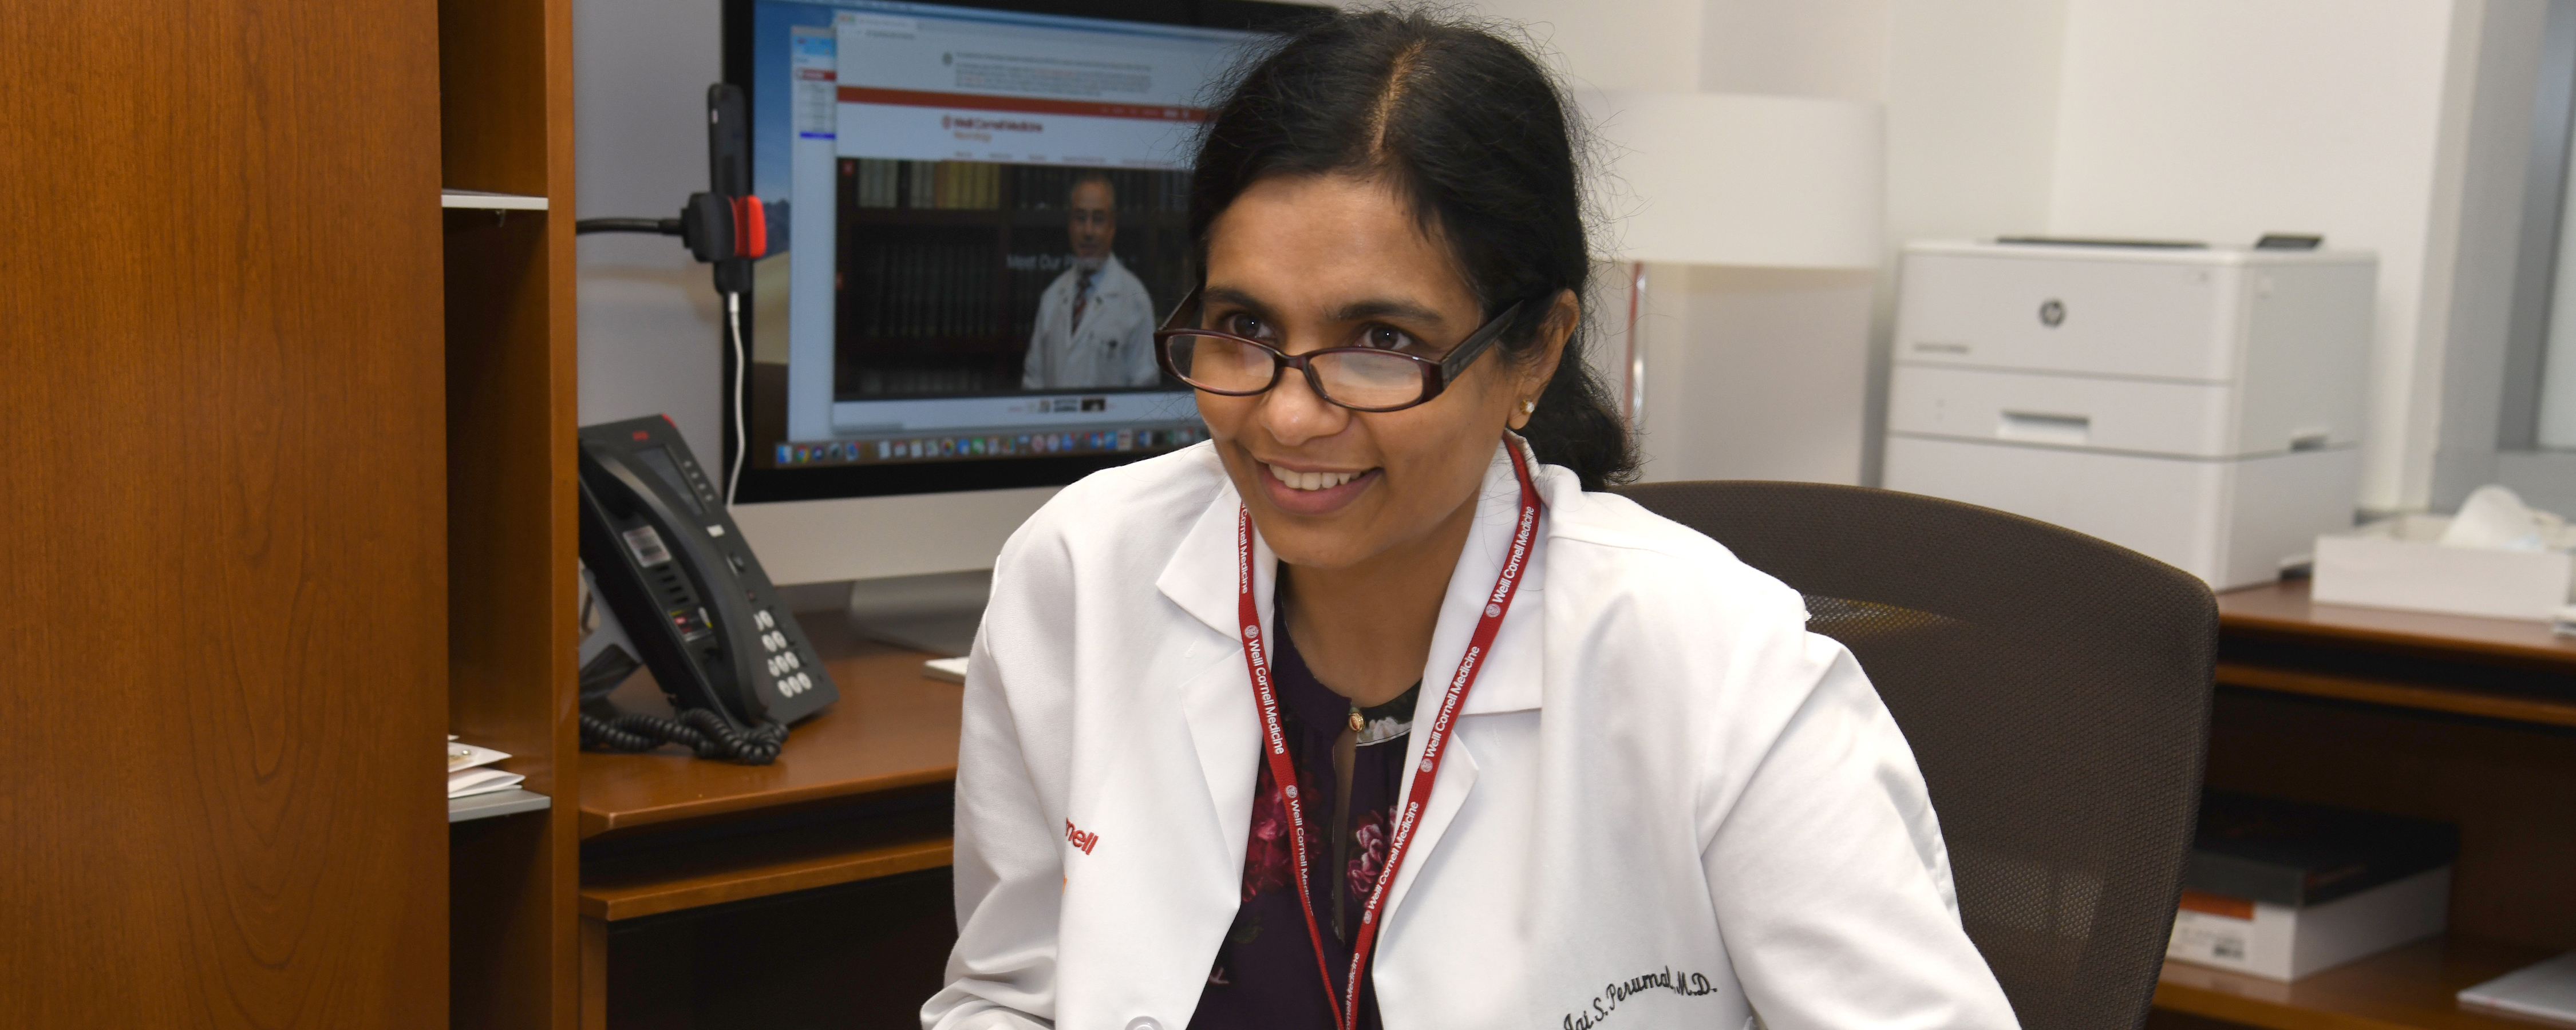 Dr. Perumal